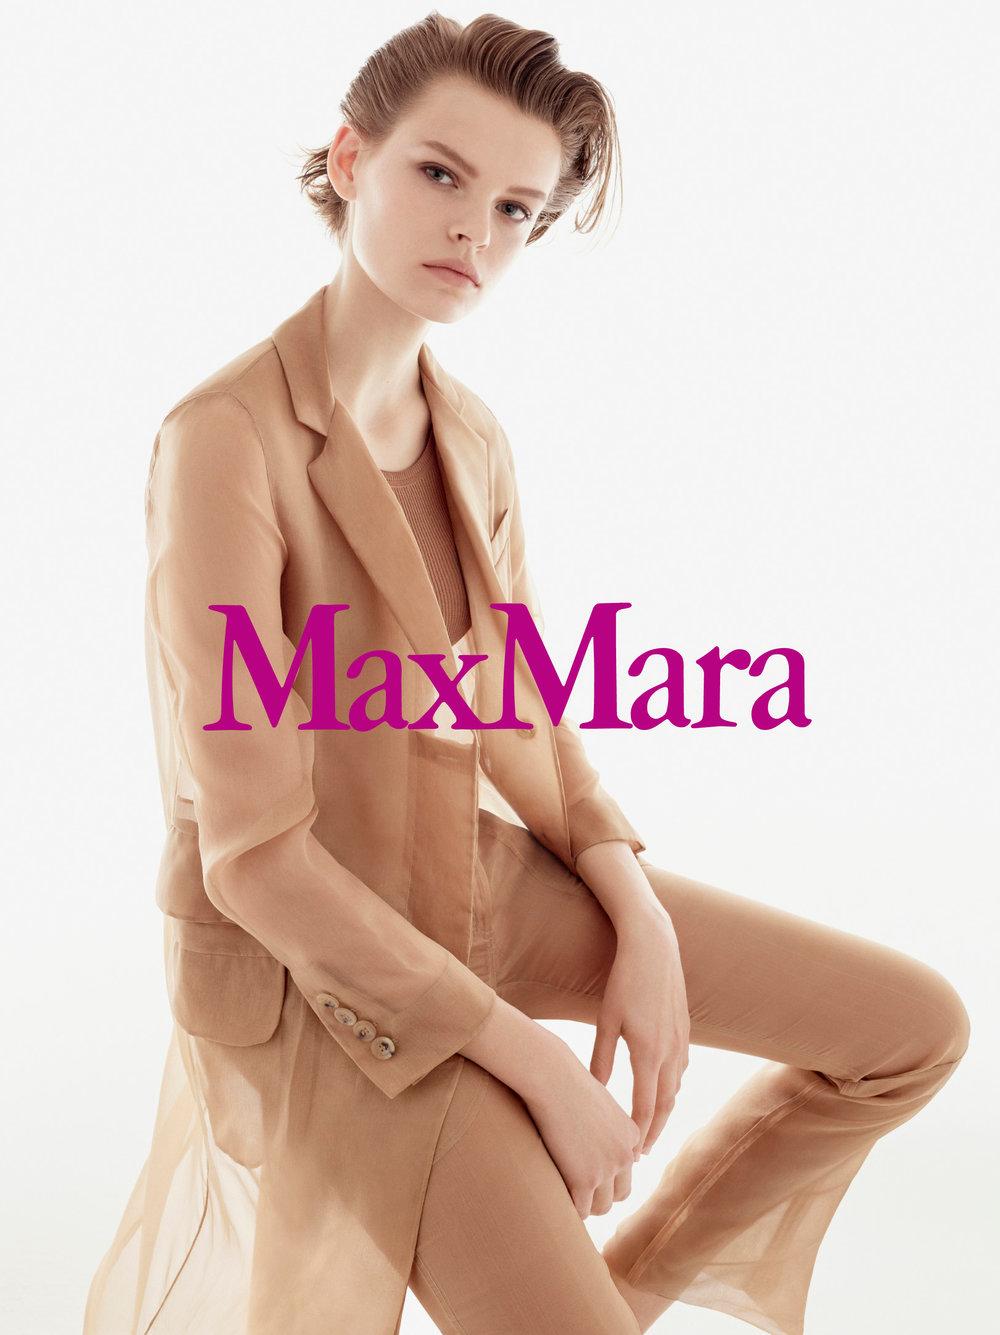 #maxmara #ss18 #stevenmeisel #carineroitfeld #carataylor #fashion #campaign #jimkaemmerling #patmcgrath #guidopalau